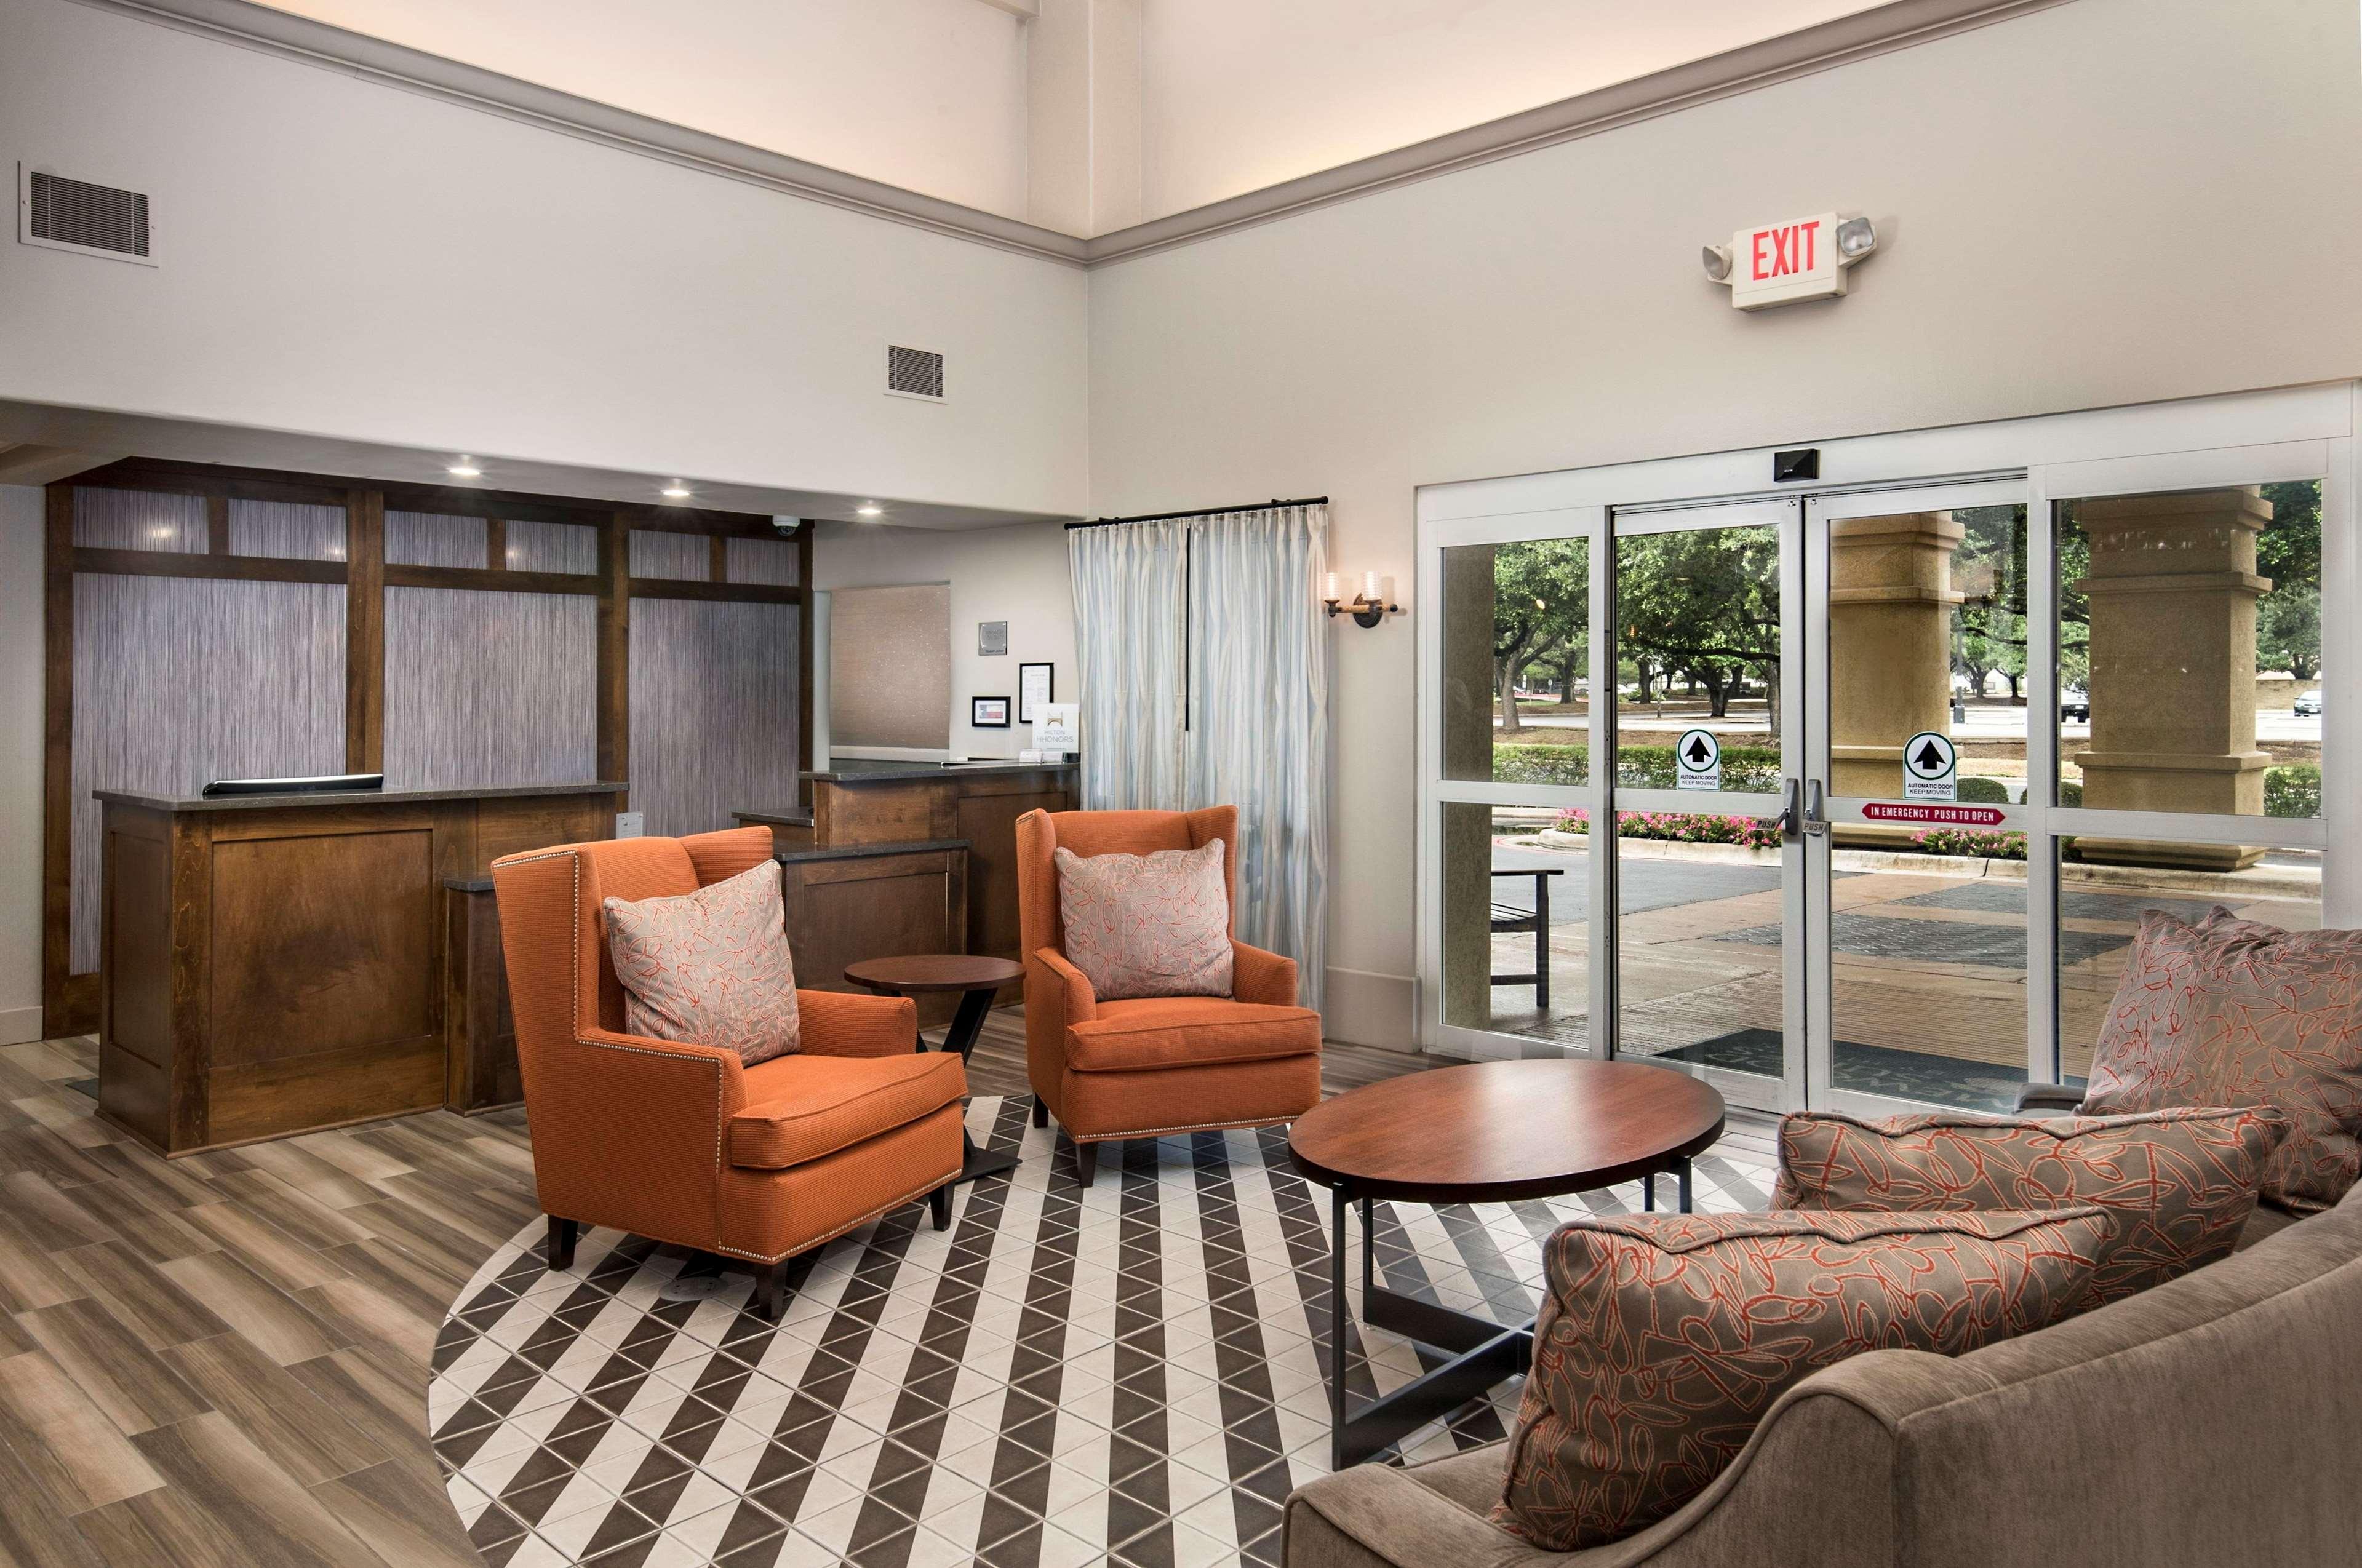 Homewood Suites by Hilton Austin-South/Airport image 1